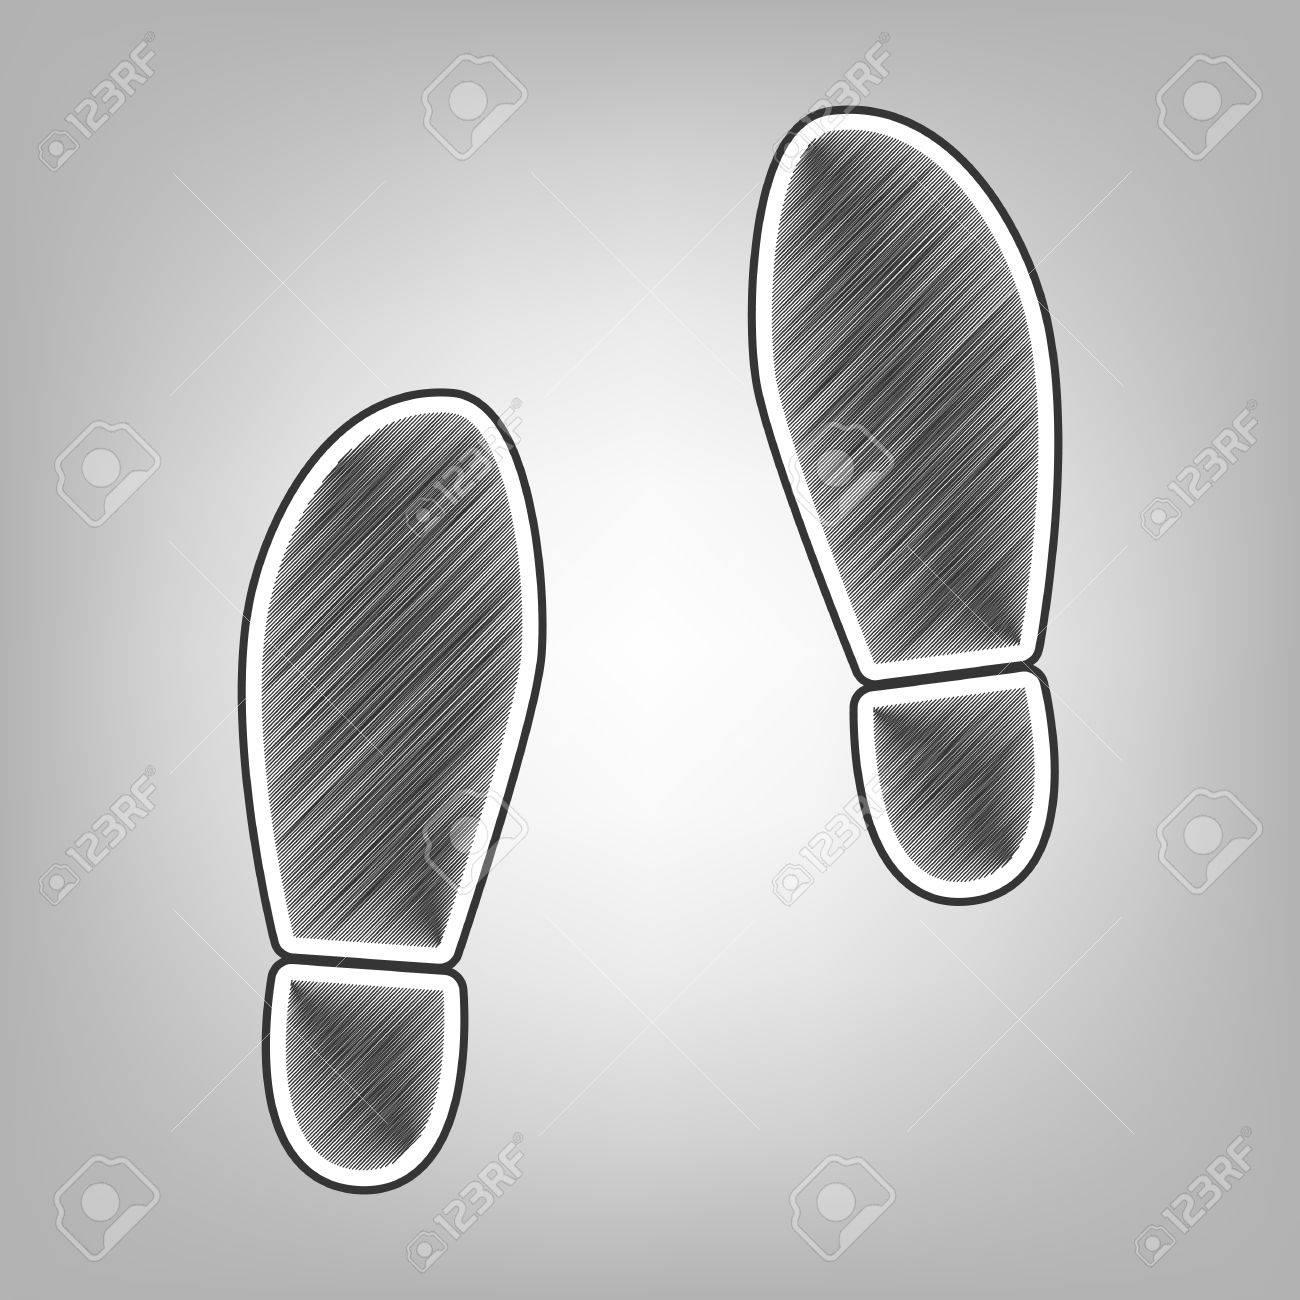 Imprint soles shoes sign vector pencil sketch imitation dark gray scribble icon with